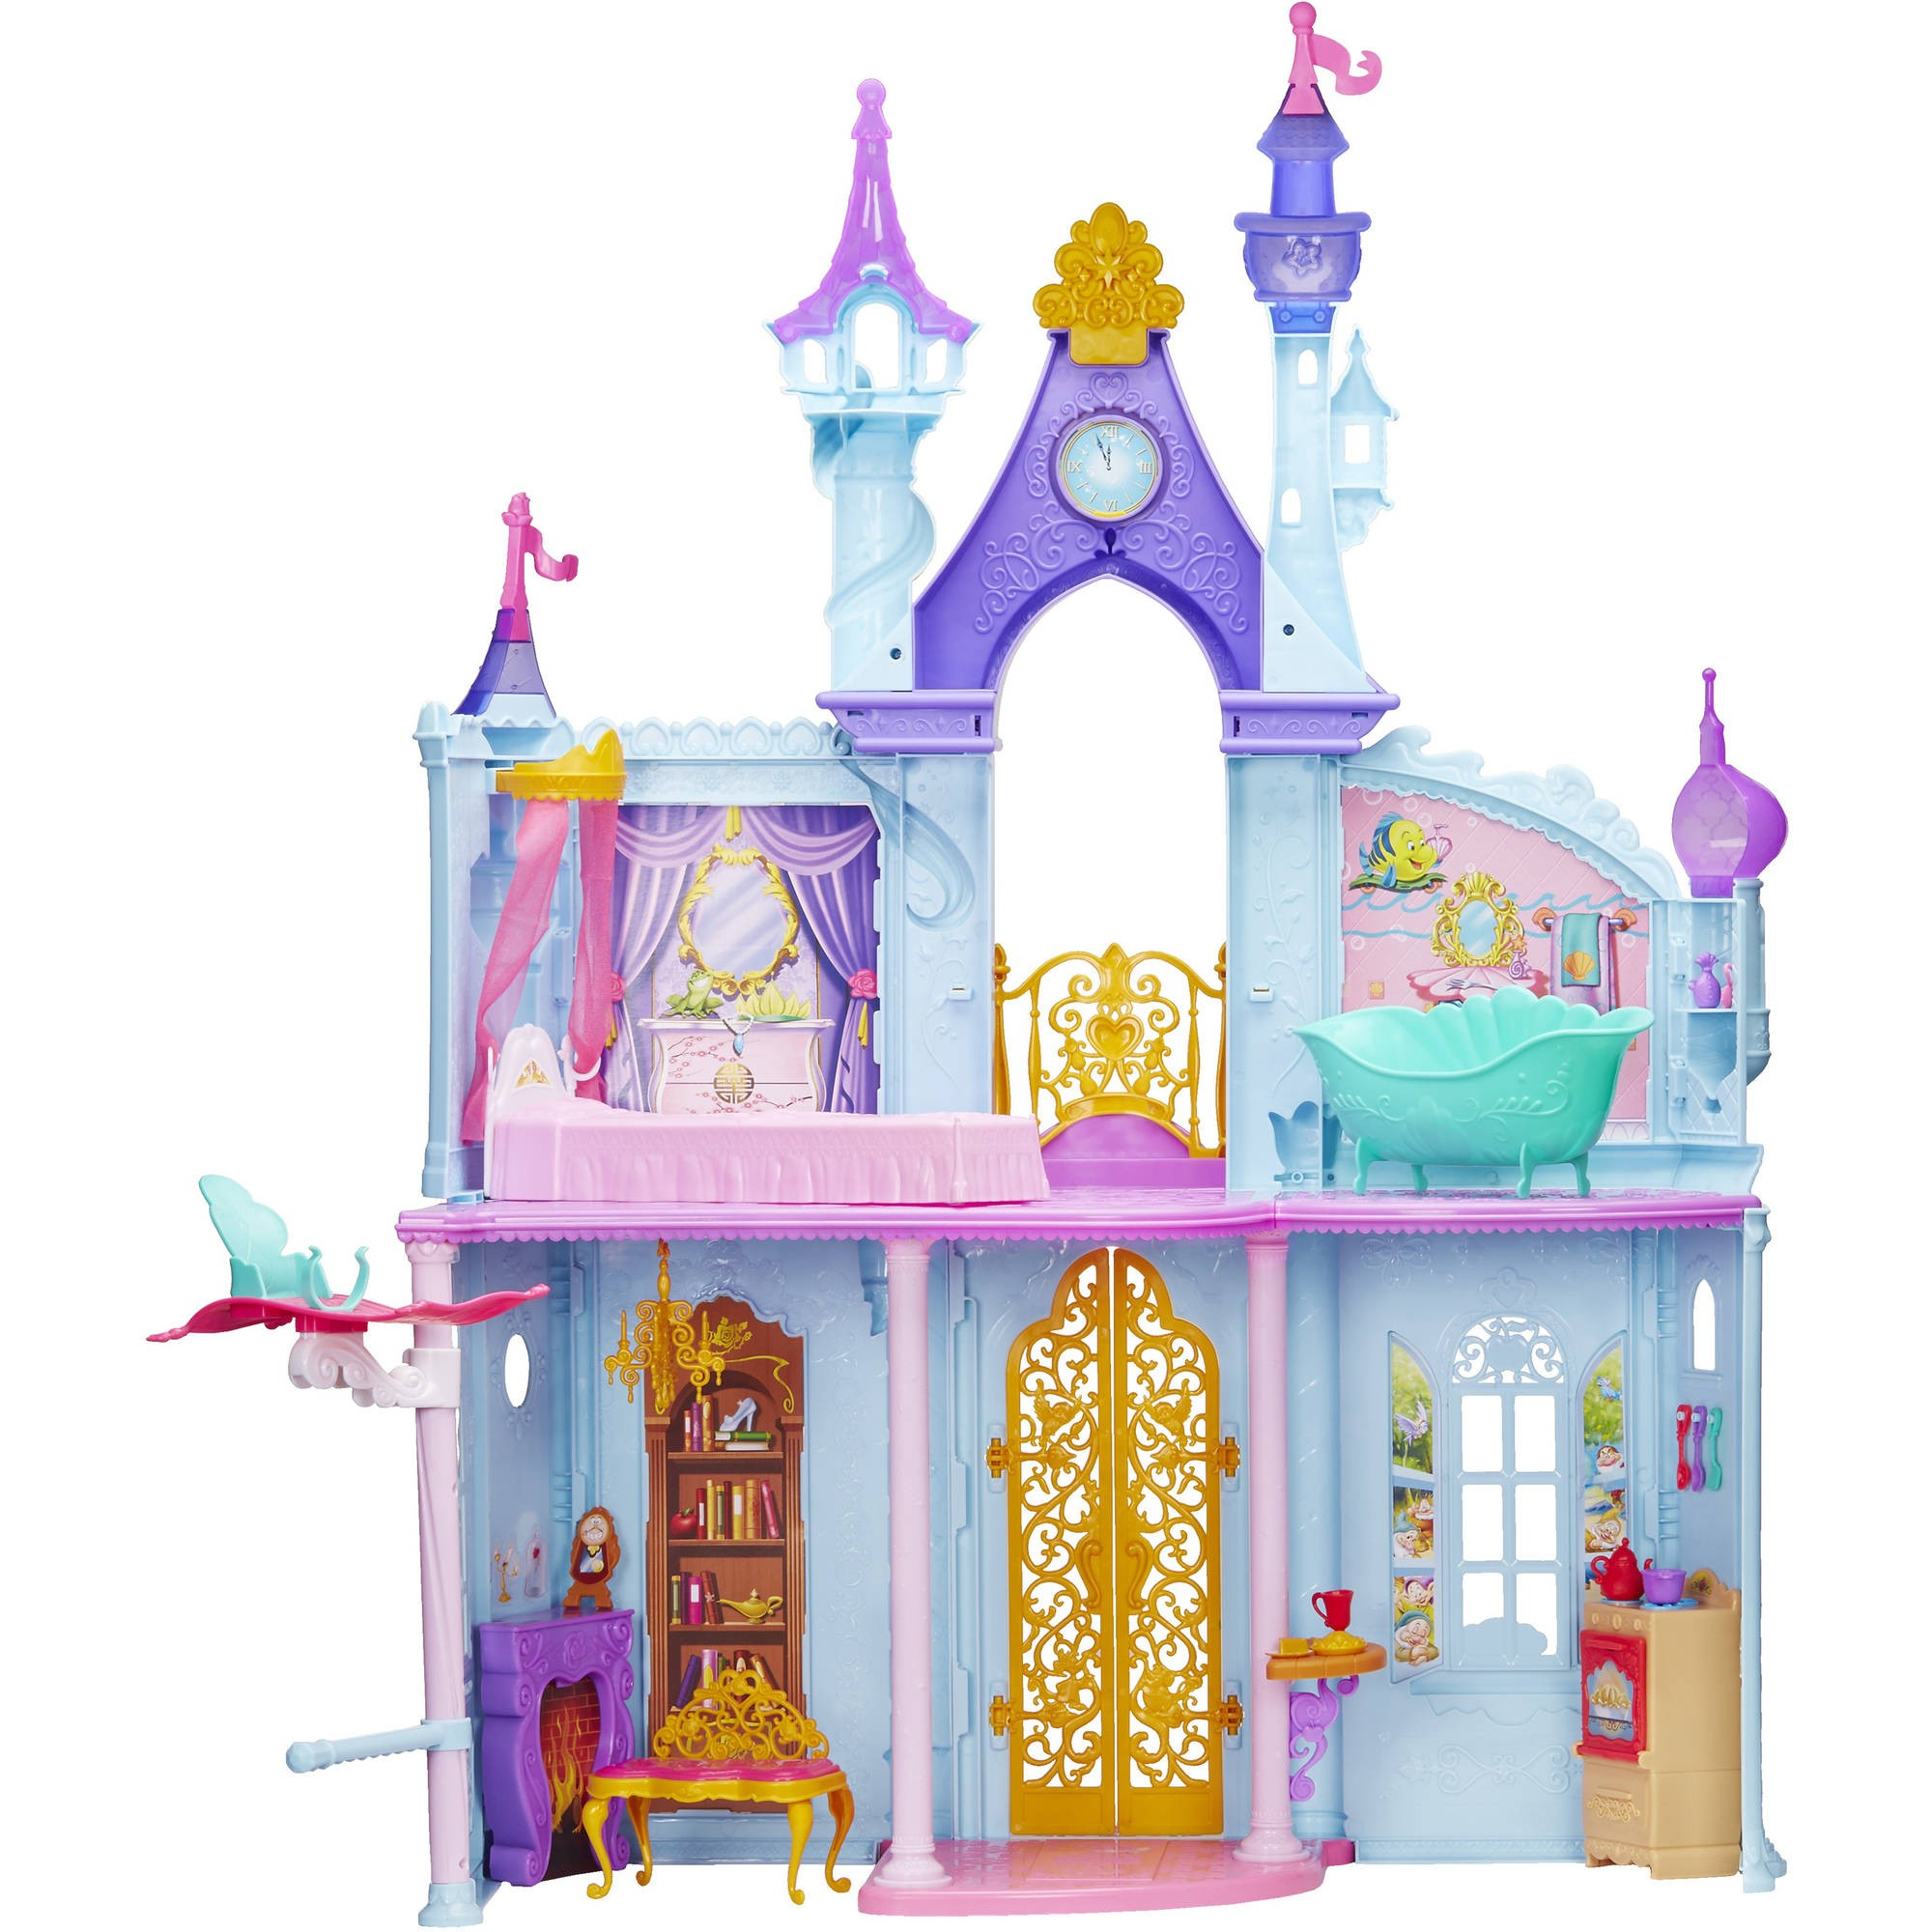 2000x2000 Disney Princess Castle